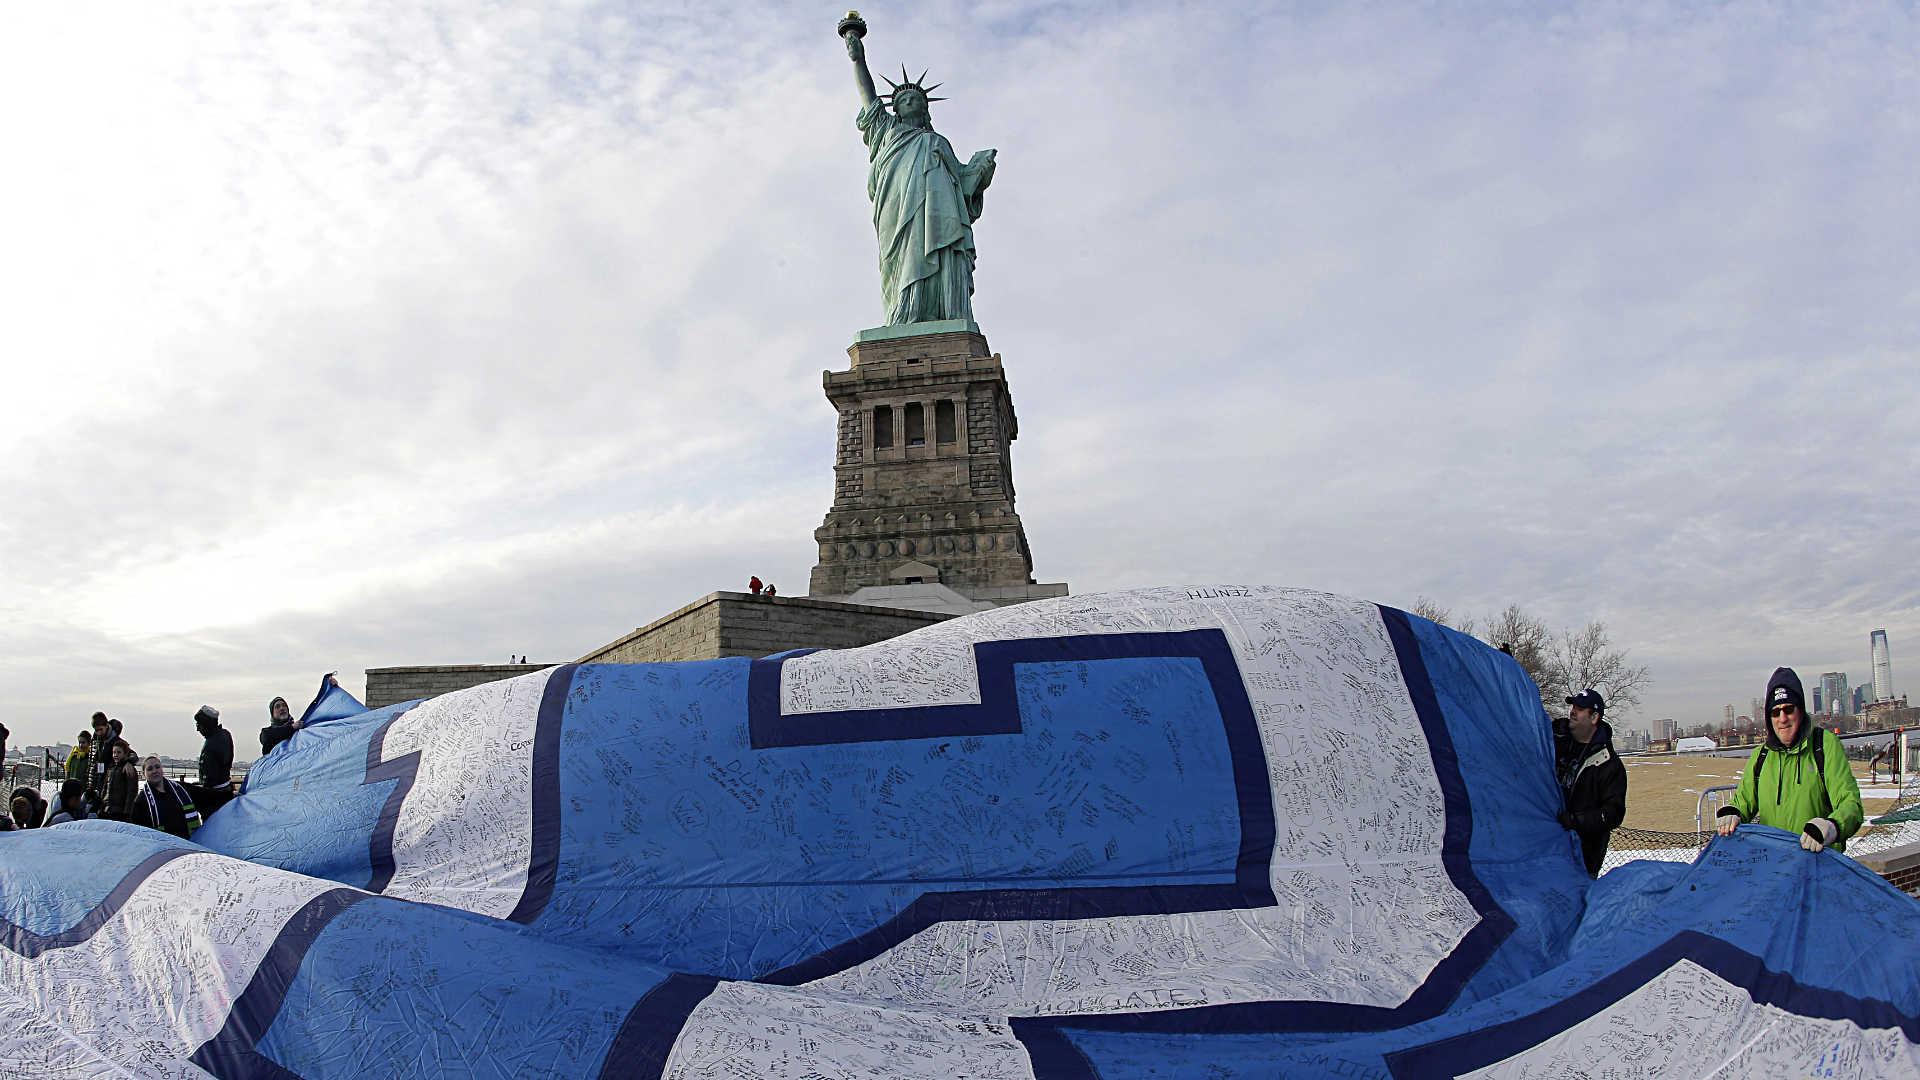 Seahawks-fans-Super-Bowl-48-nyc-ap-FTR